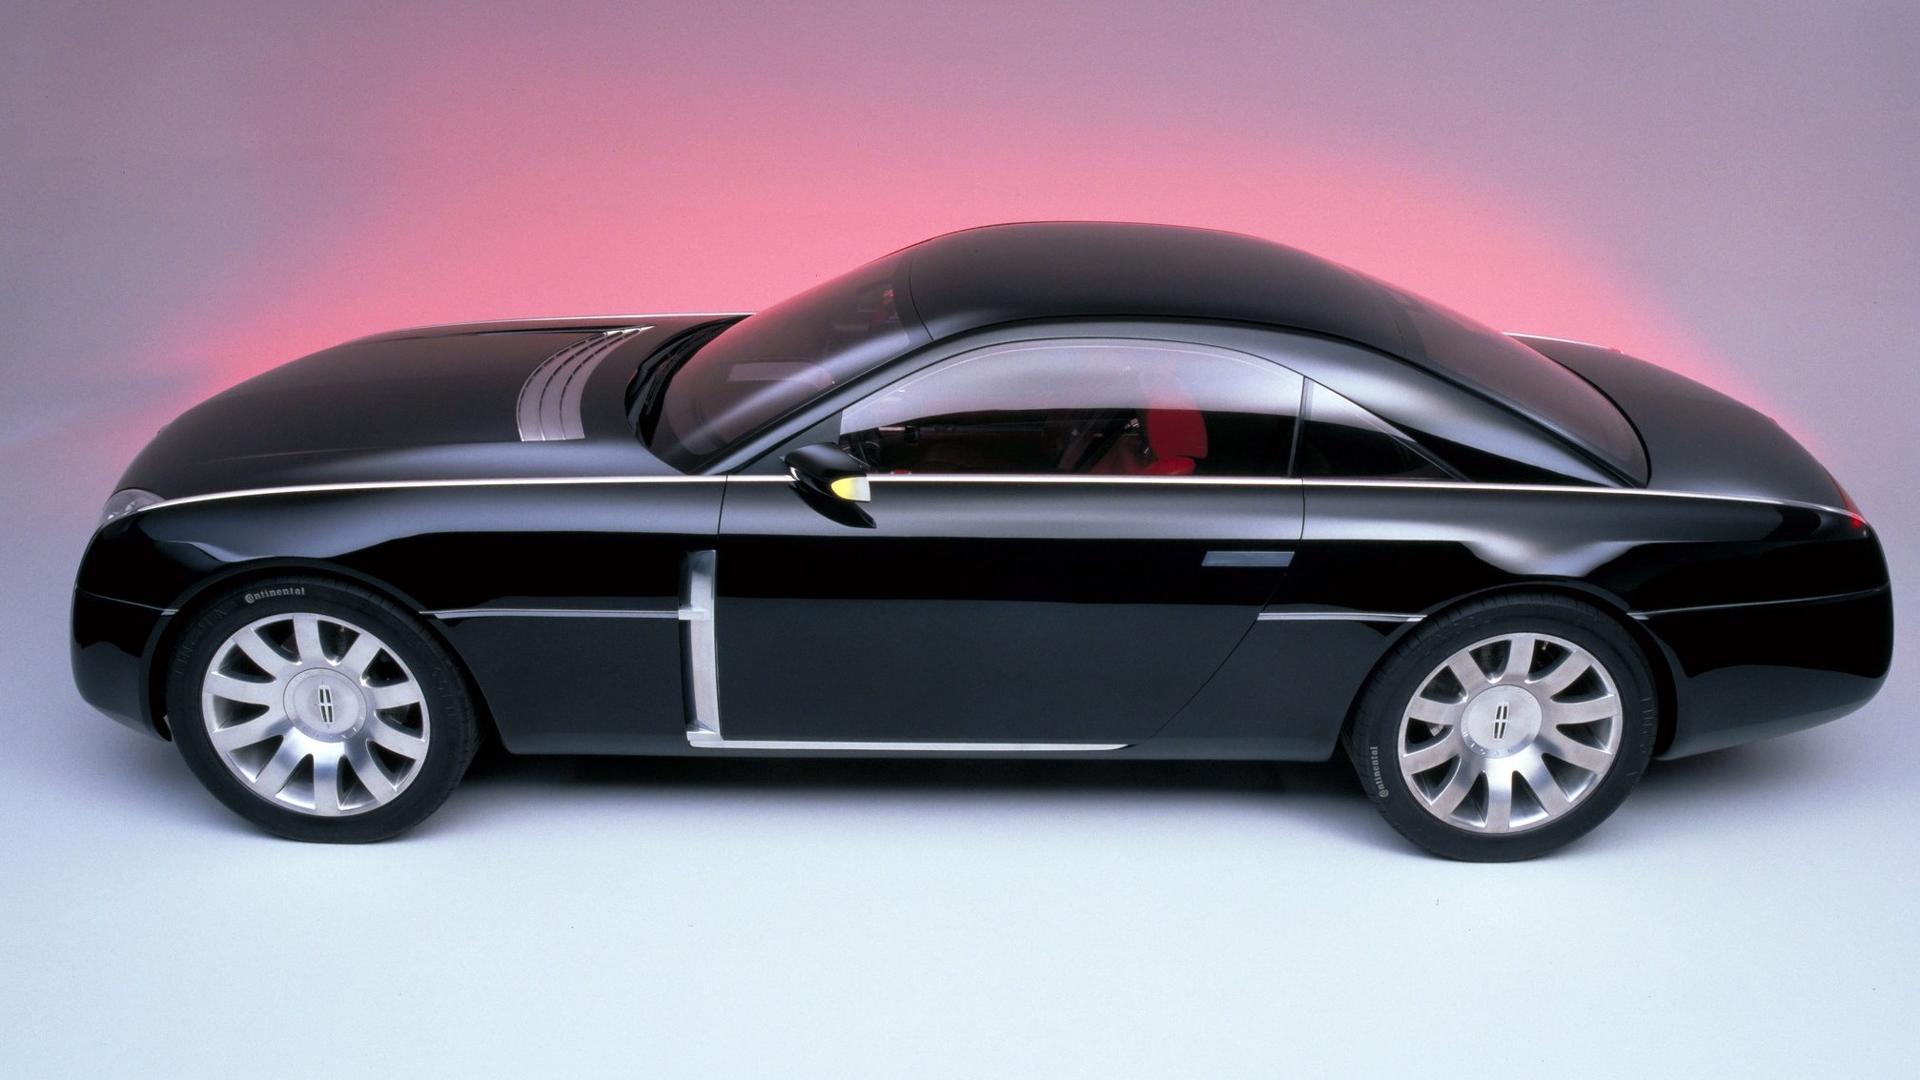 2001 lincoln mk9 concept we forgot